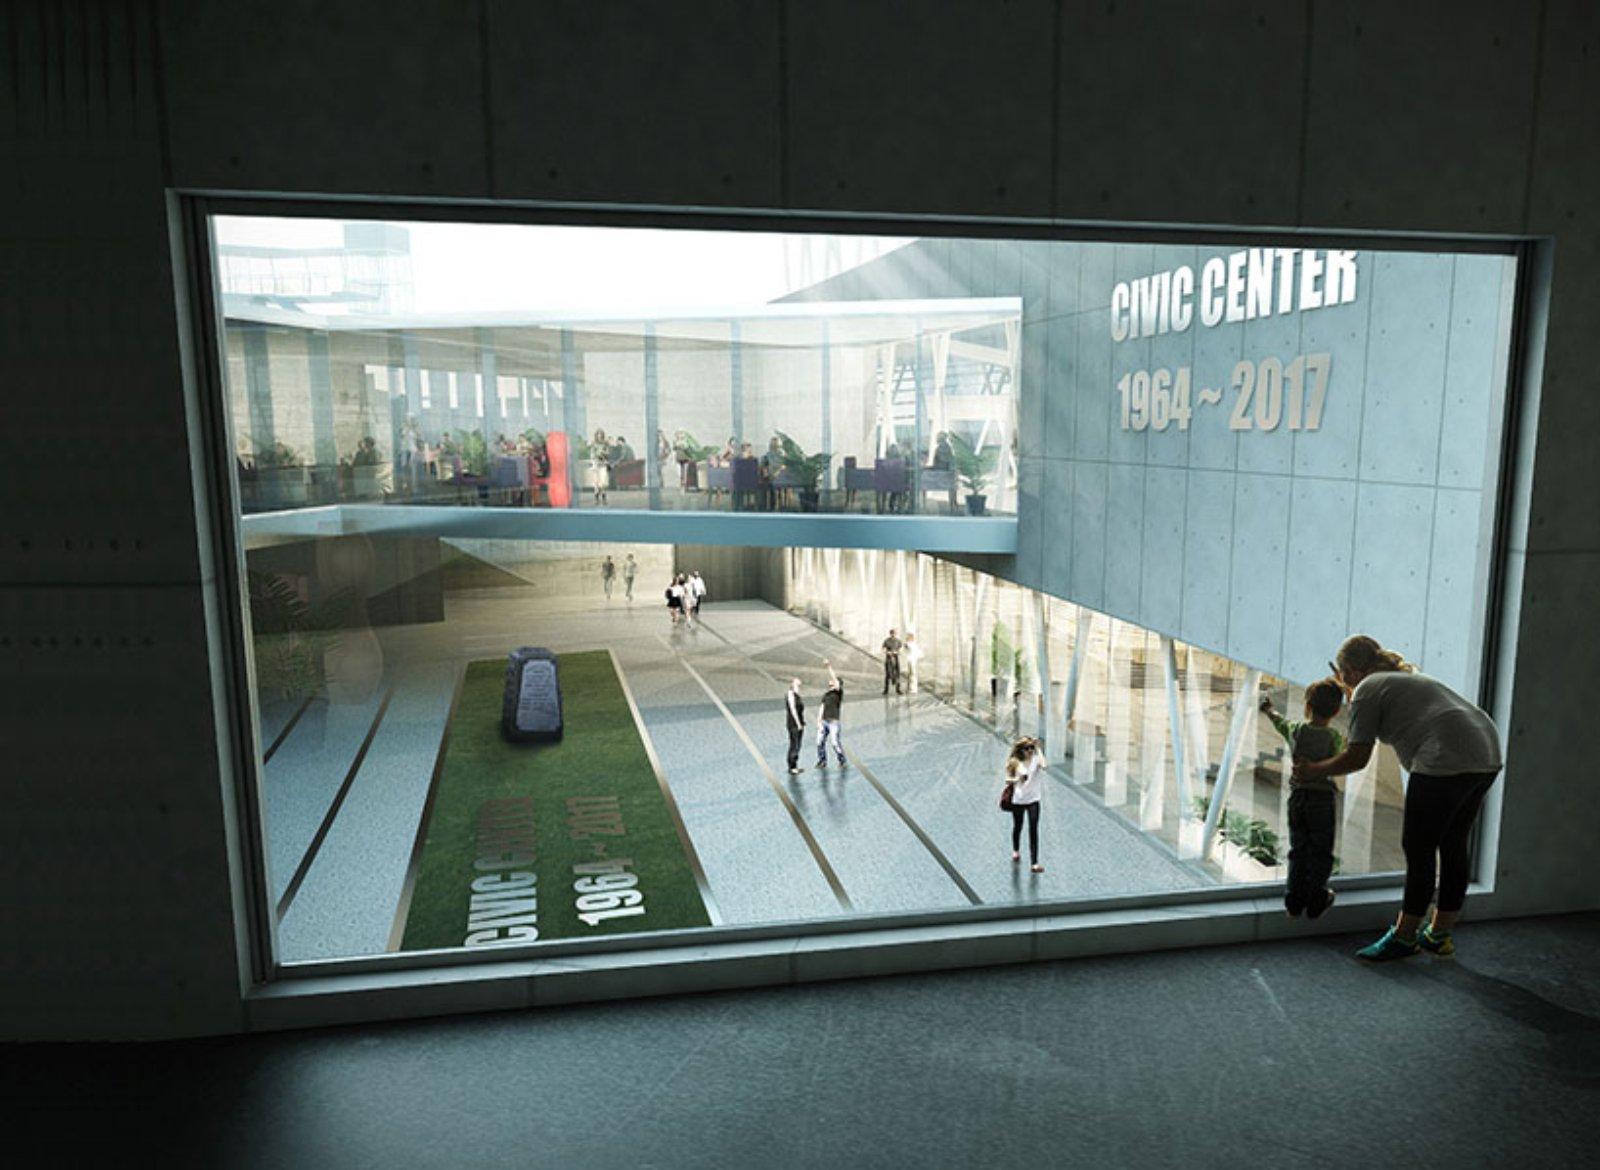 Ryde Civic Center